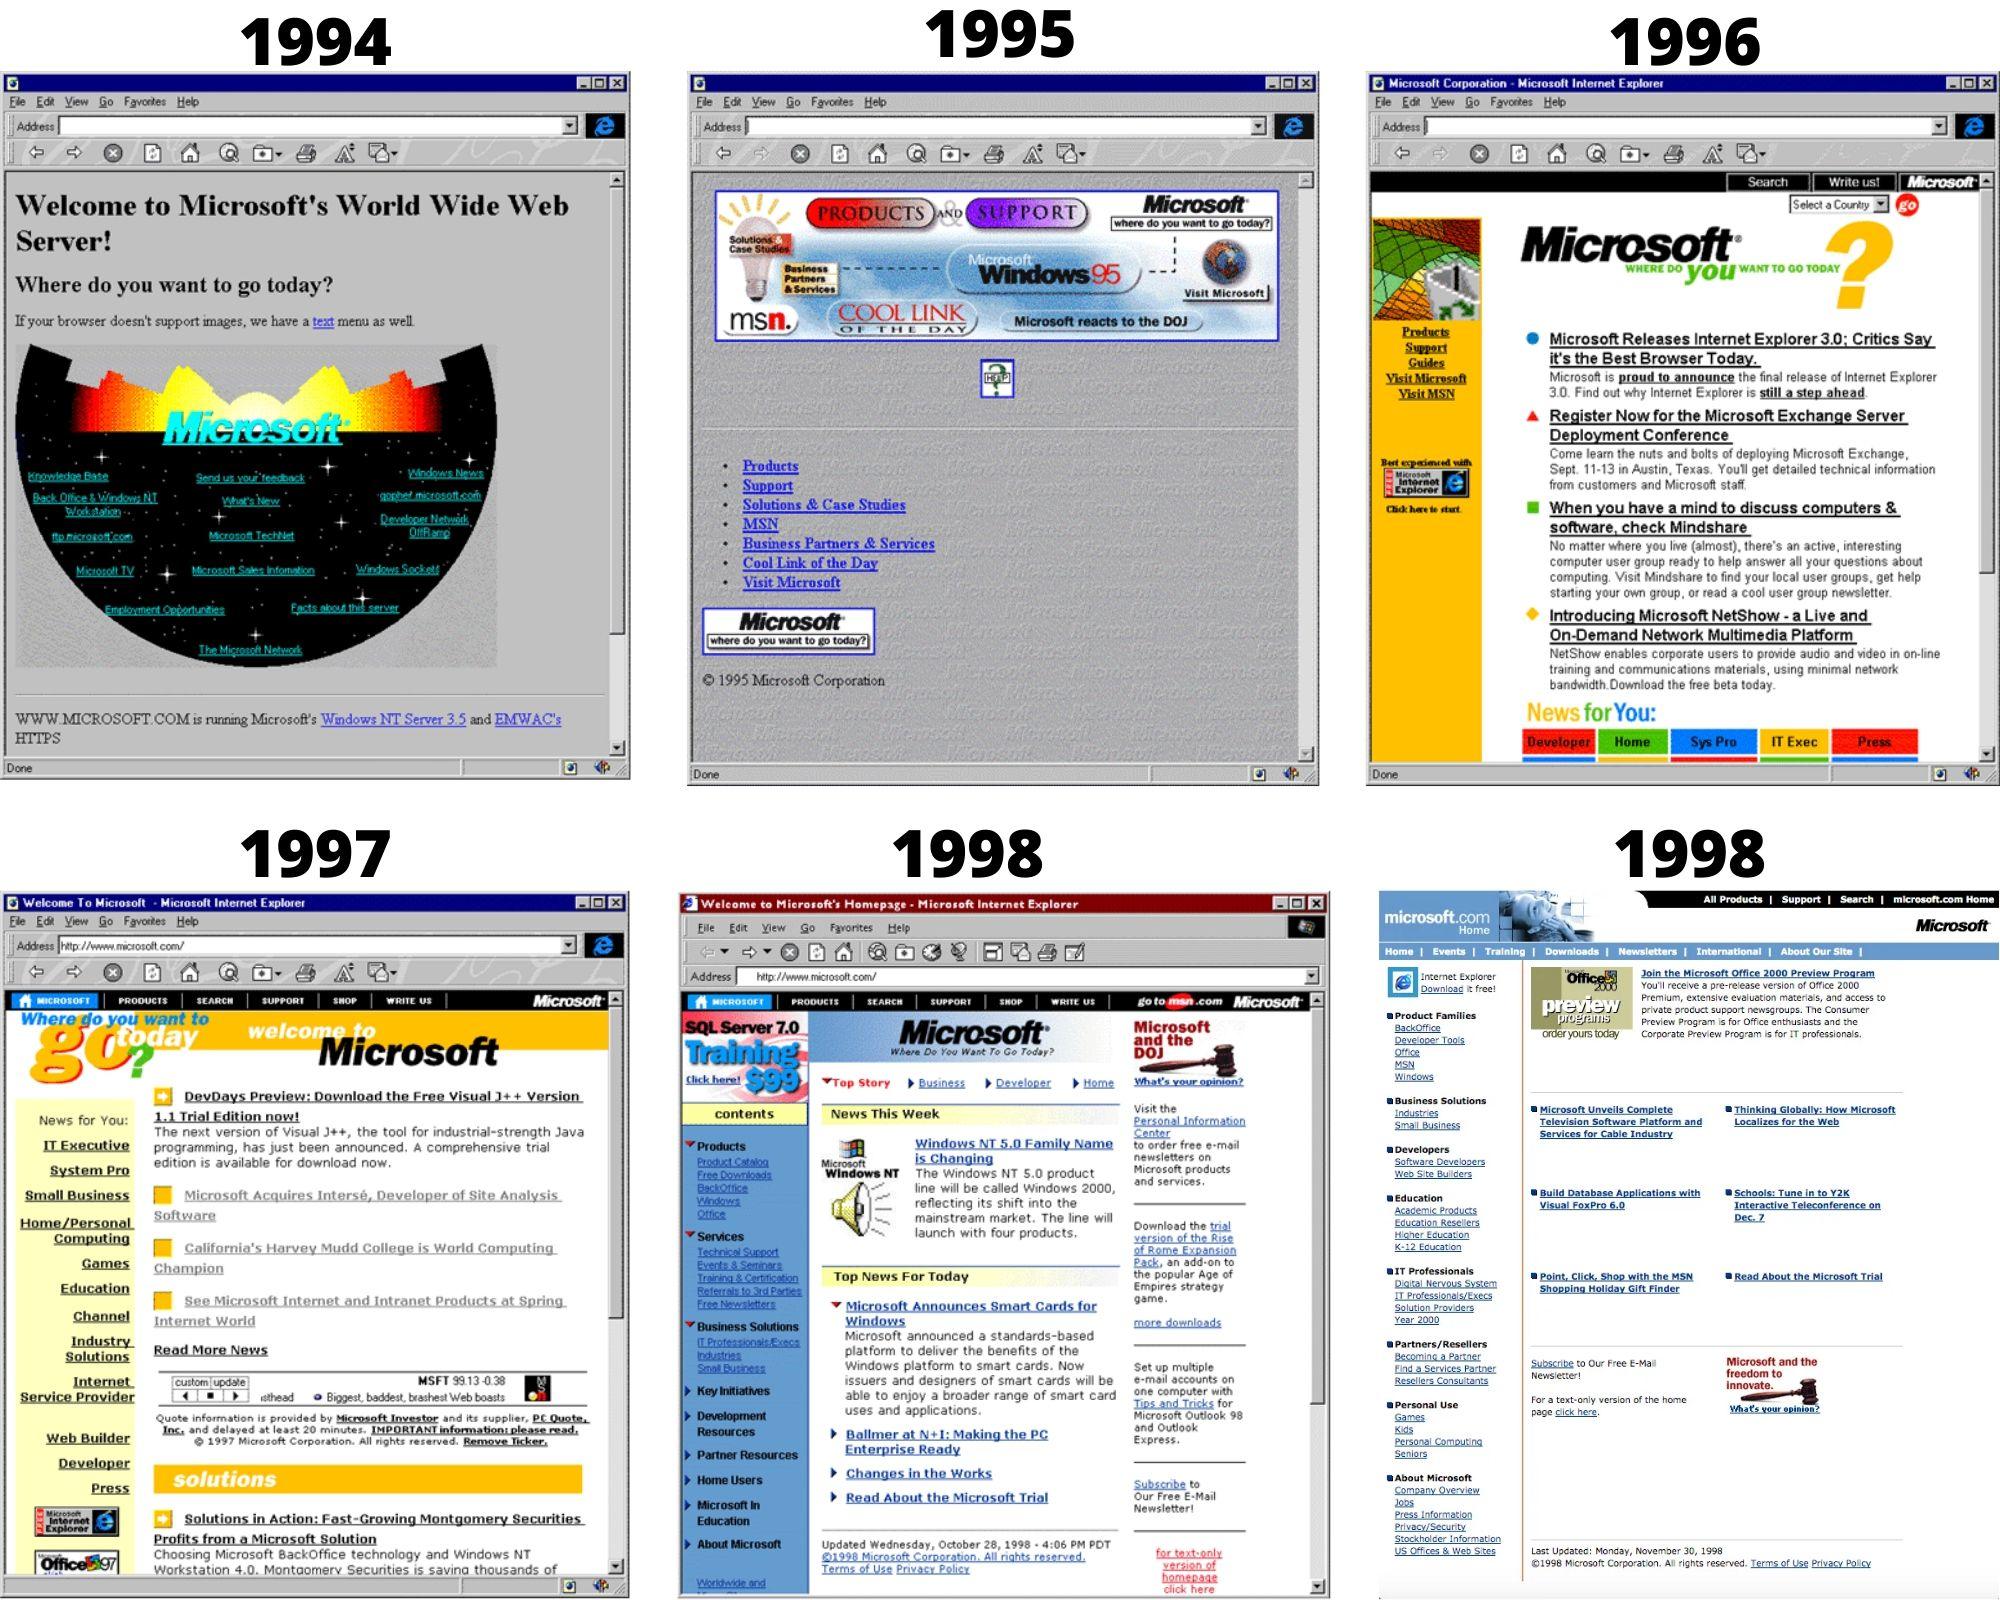 Microsoft design 1994 to 1998